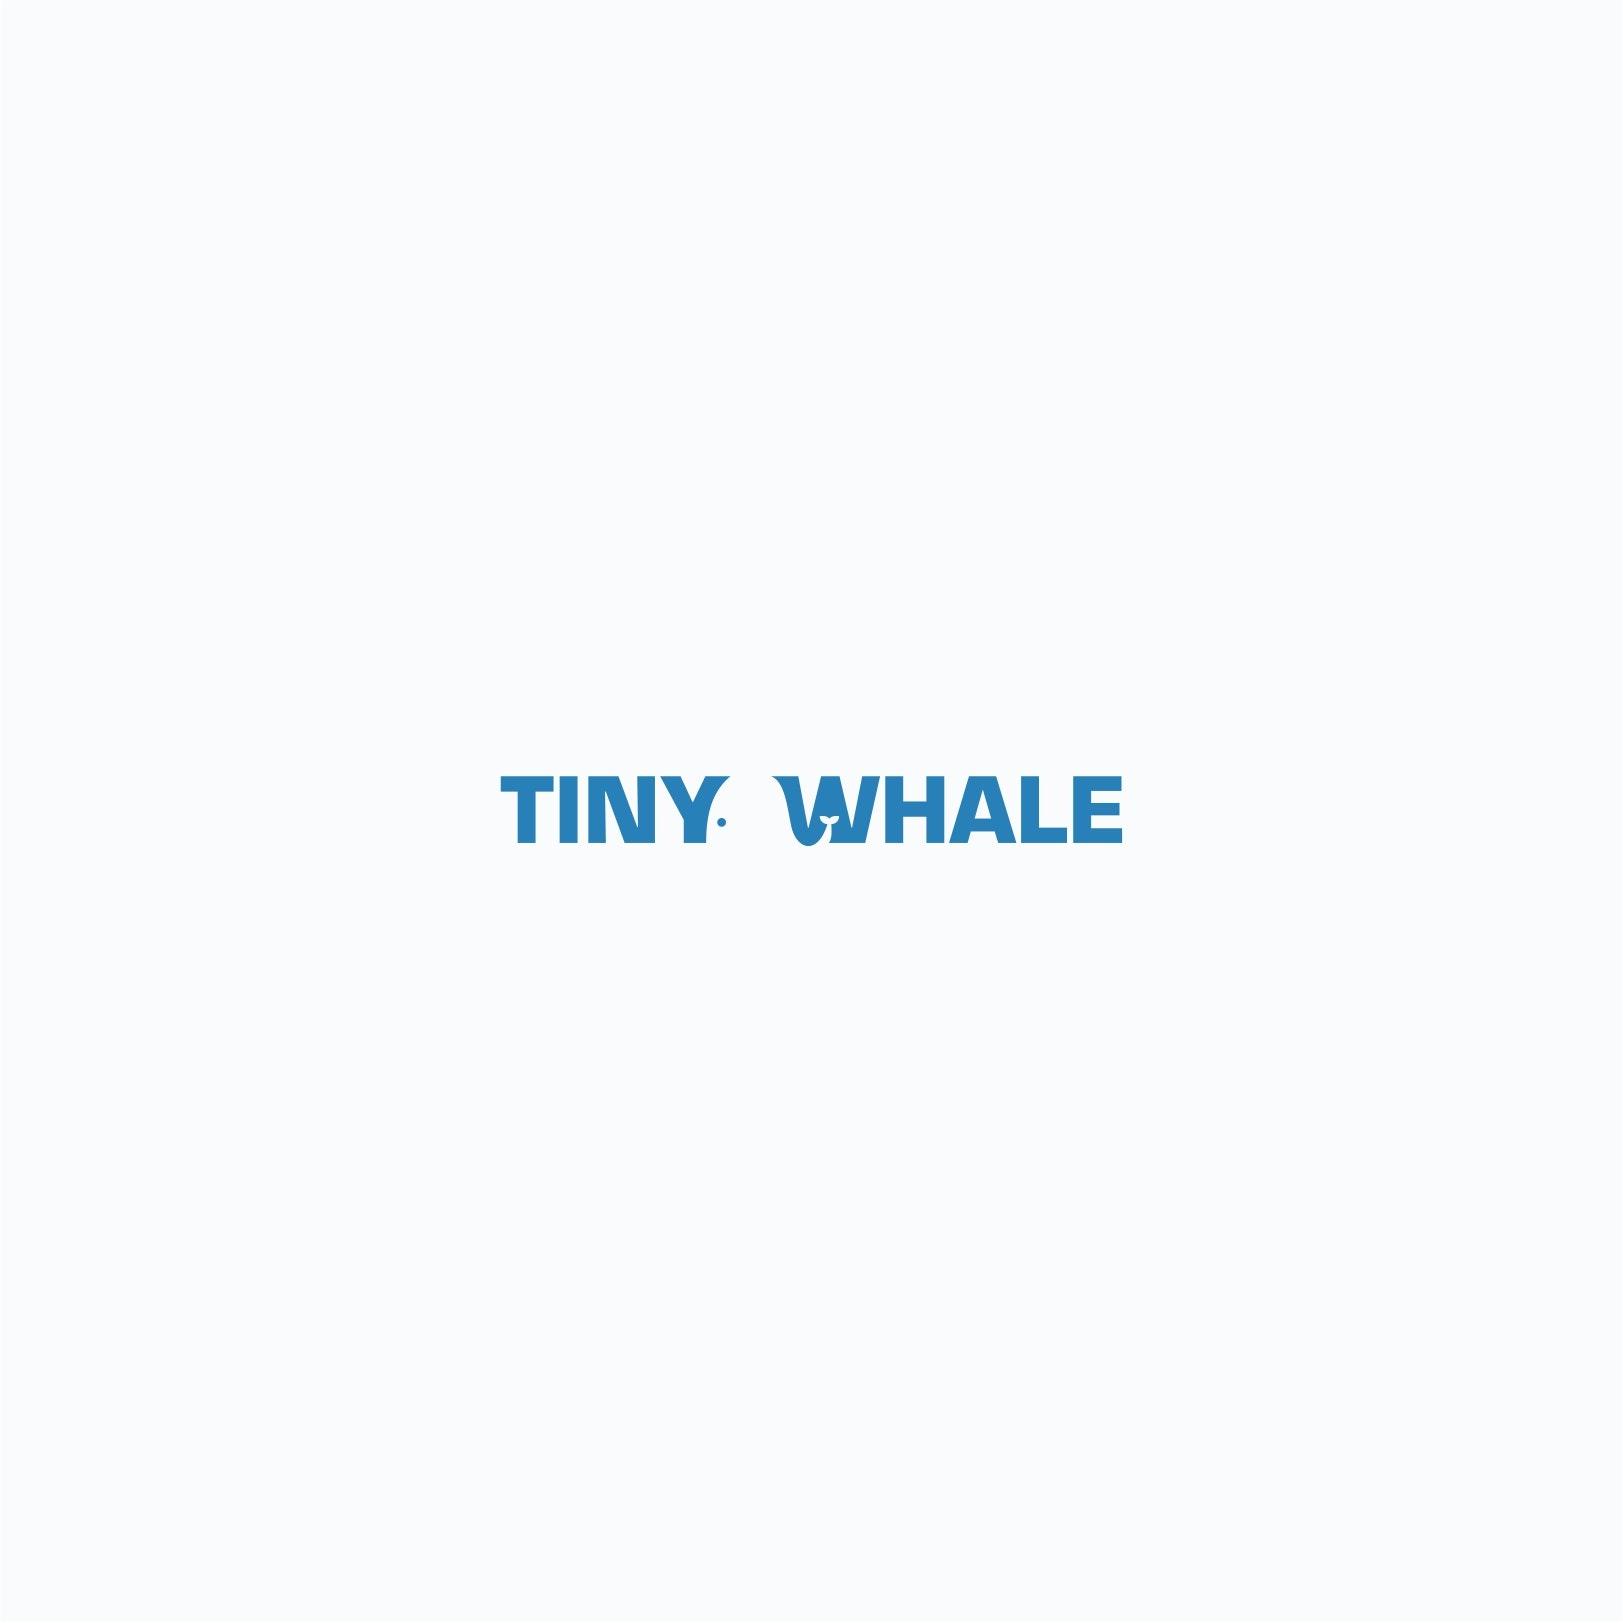 Tiny Whale logo